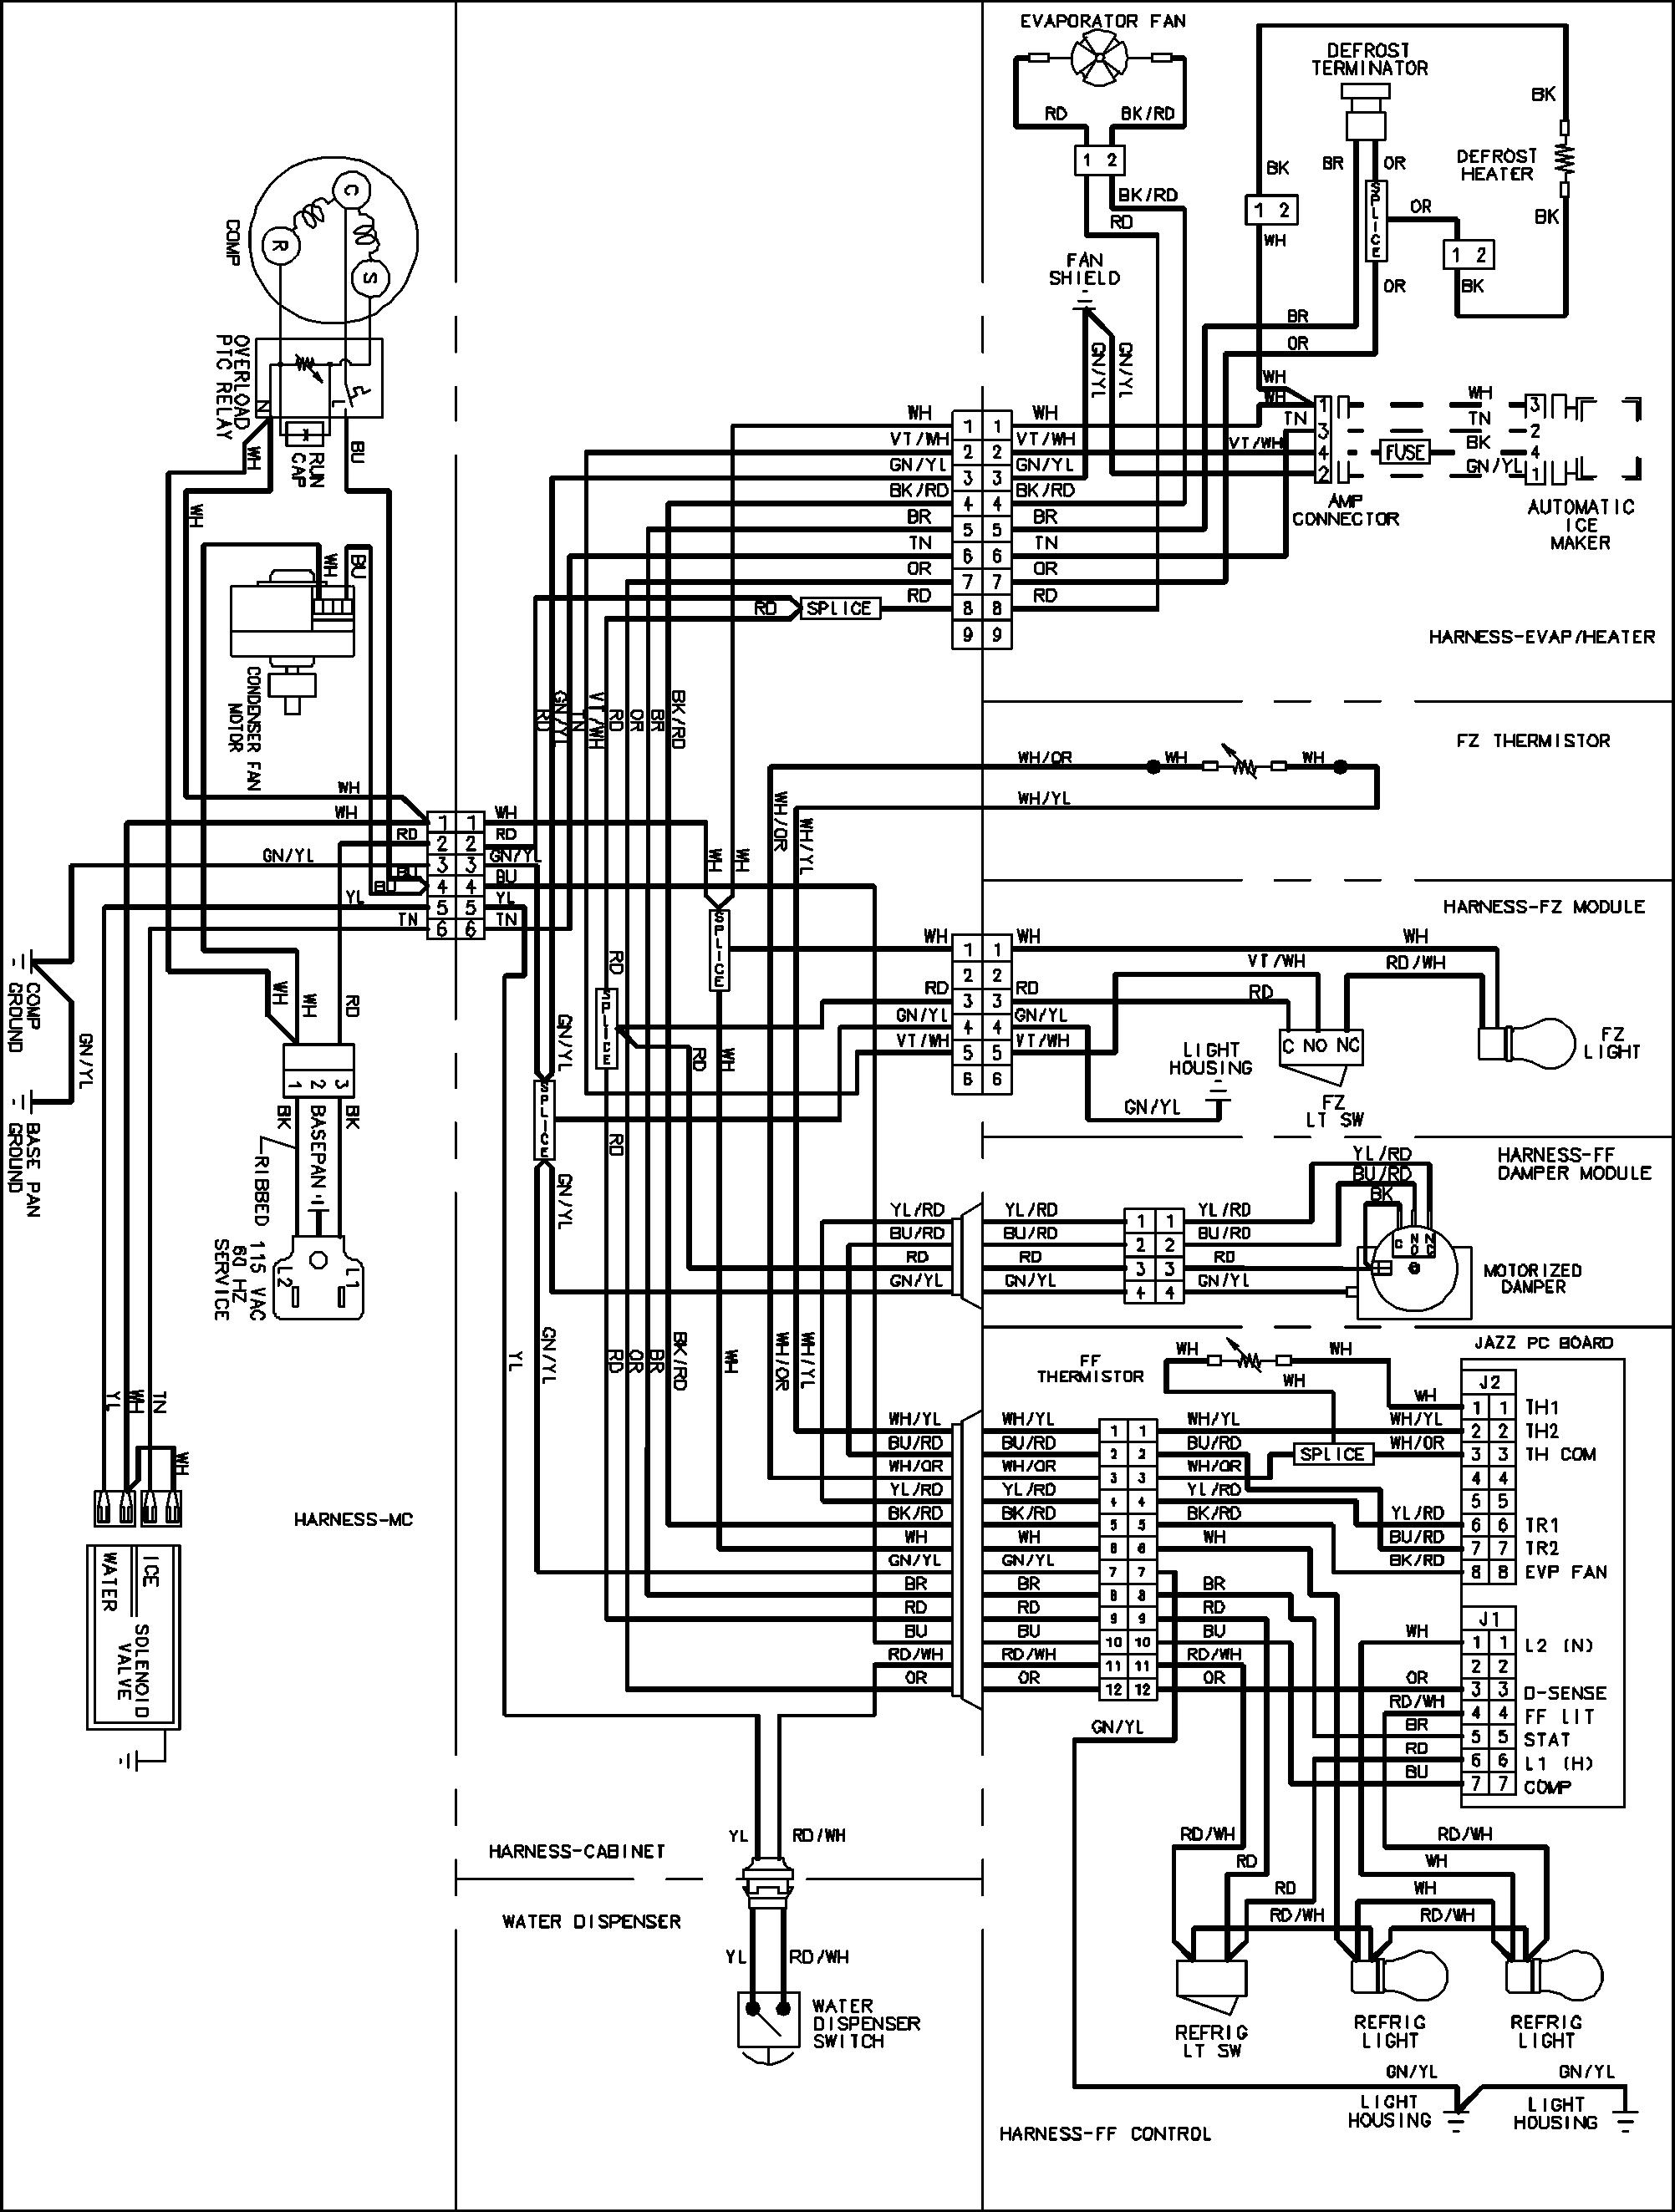 HT_3880] Refrigerator Wiring Diagram Further Amana Refrigerator Wiring  Diagram